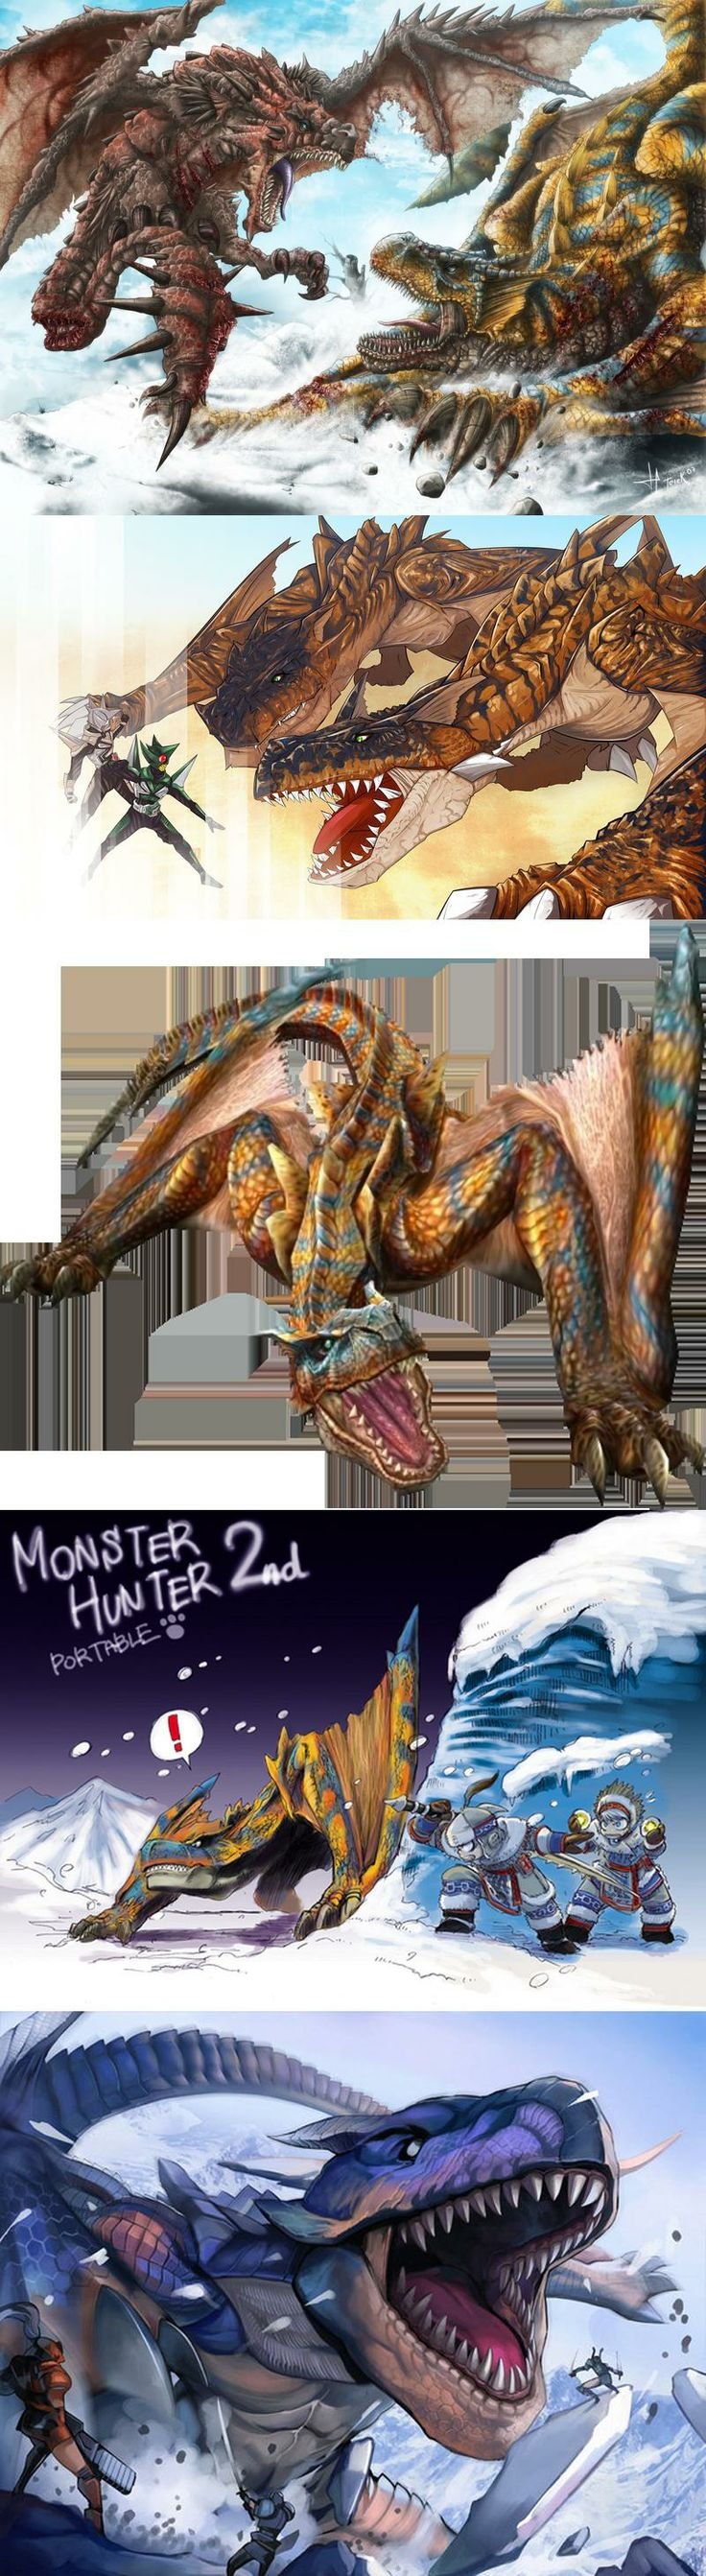 Monster hunter freedom 2 rathalos vs tig...